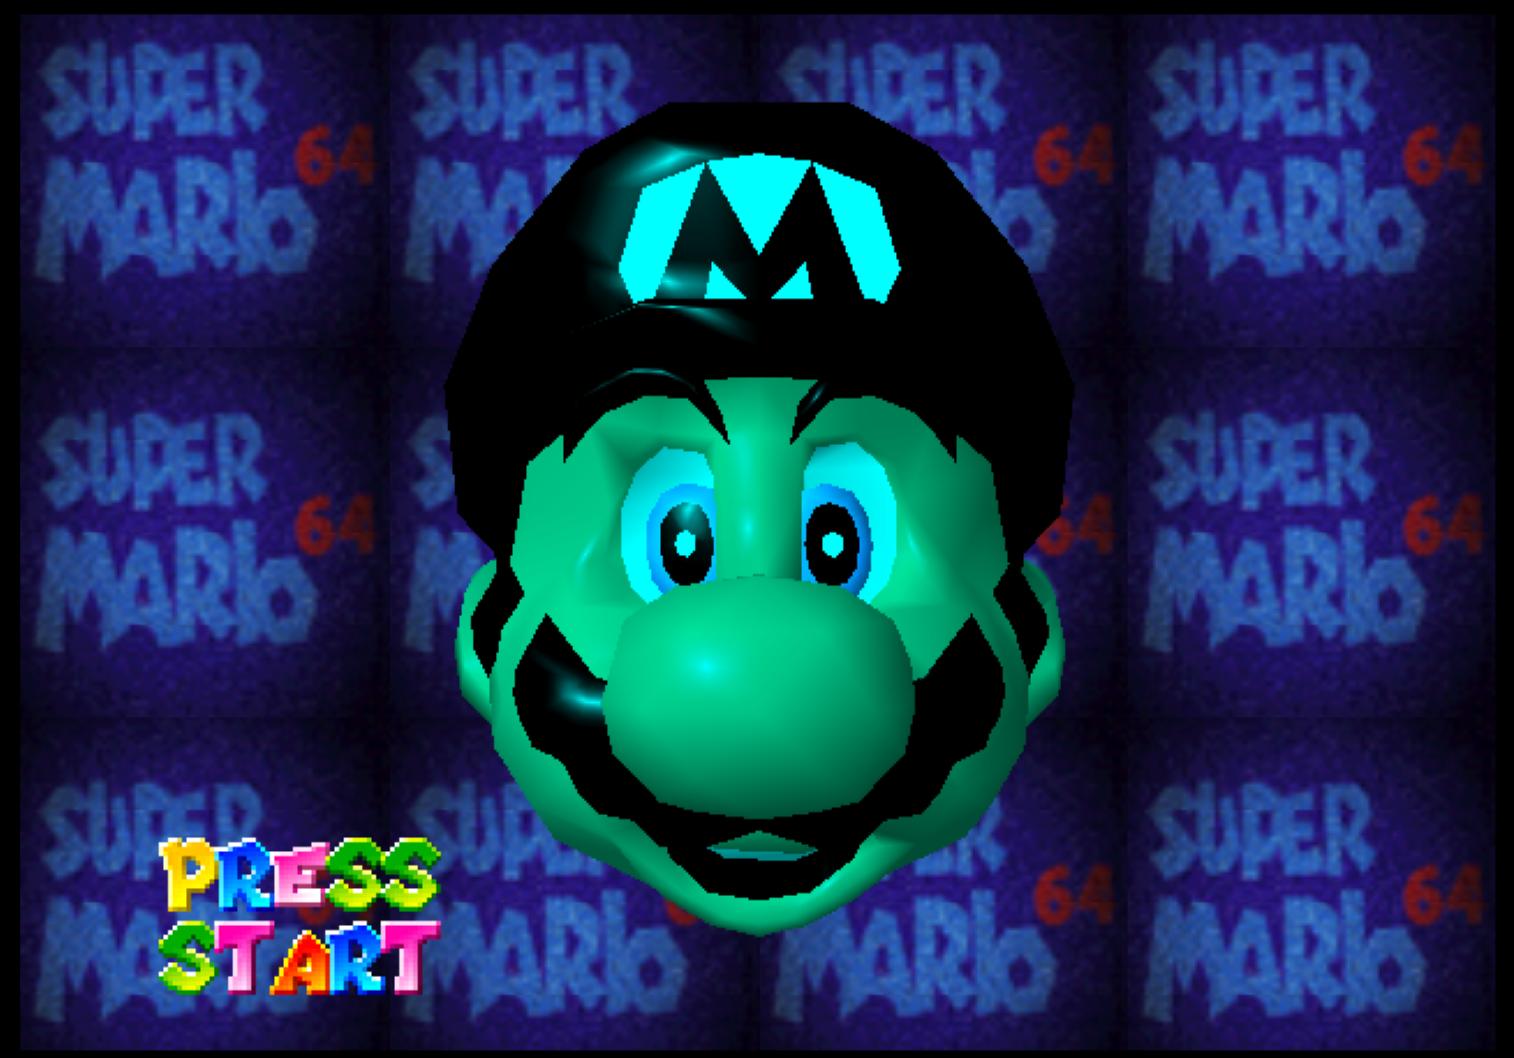 Super Mario 64 - green textures on Intel Iris Pro GPU